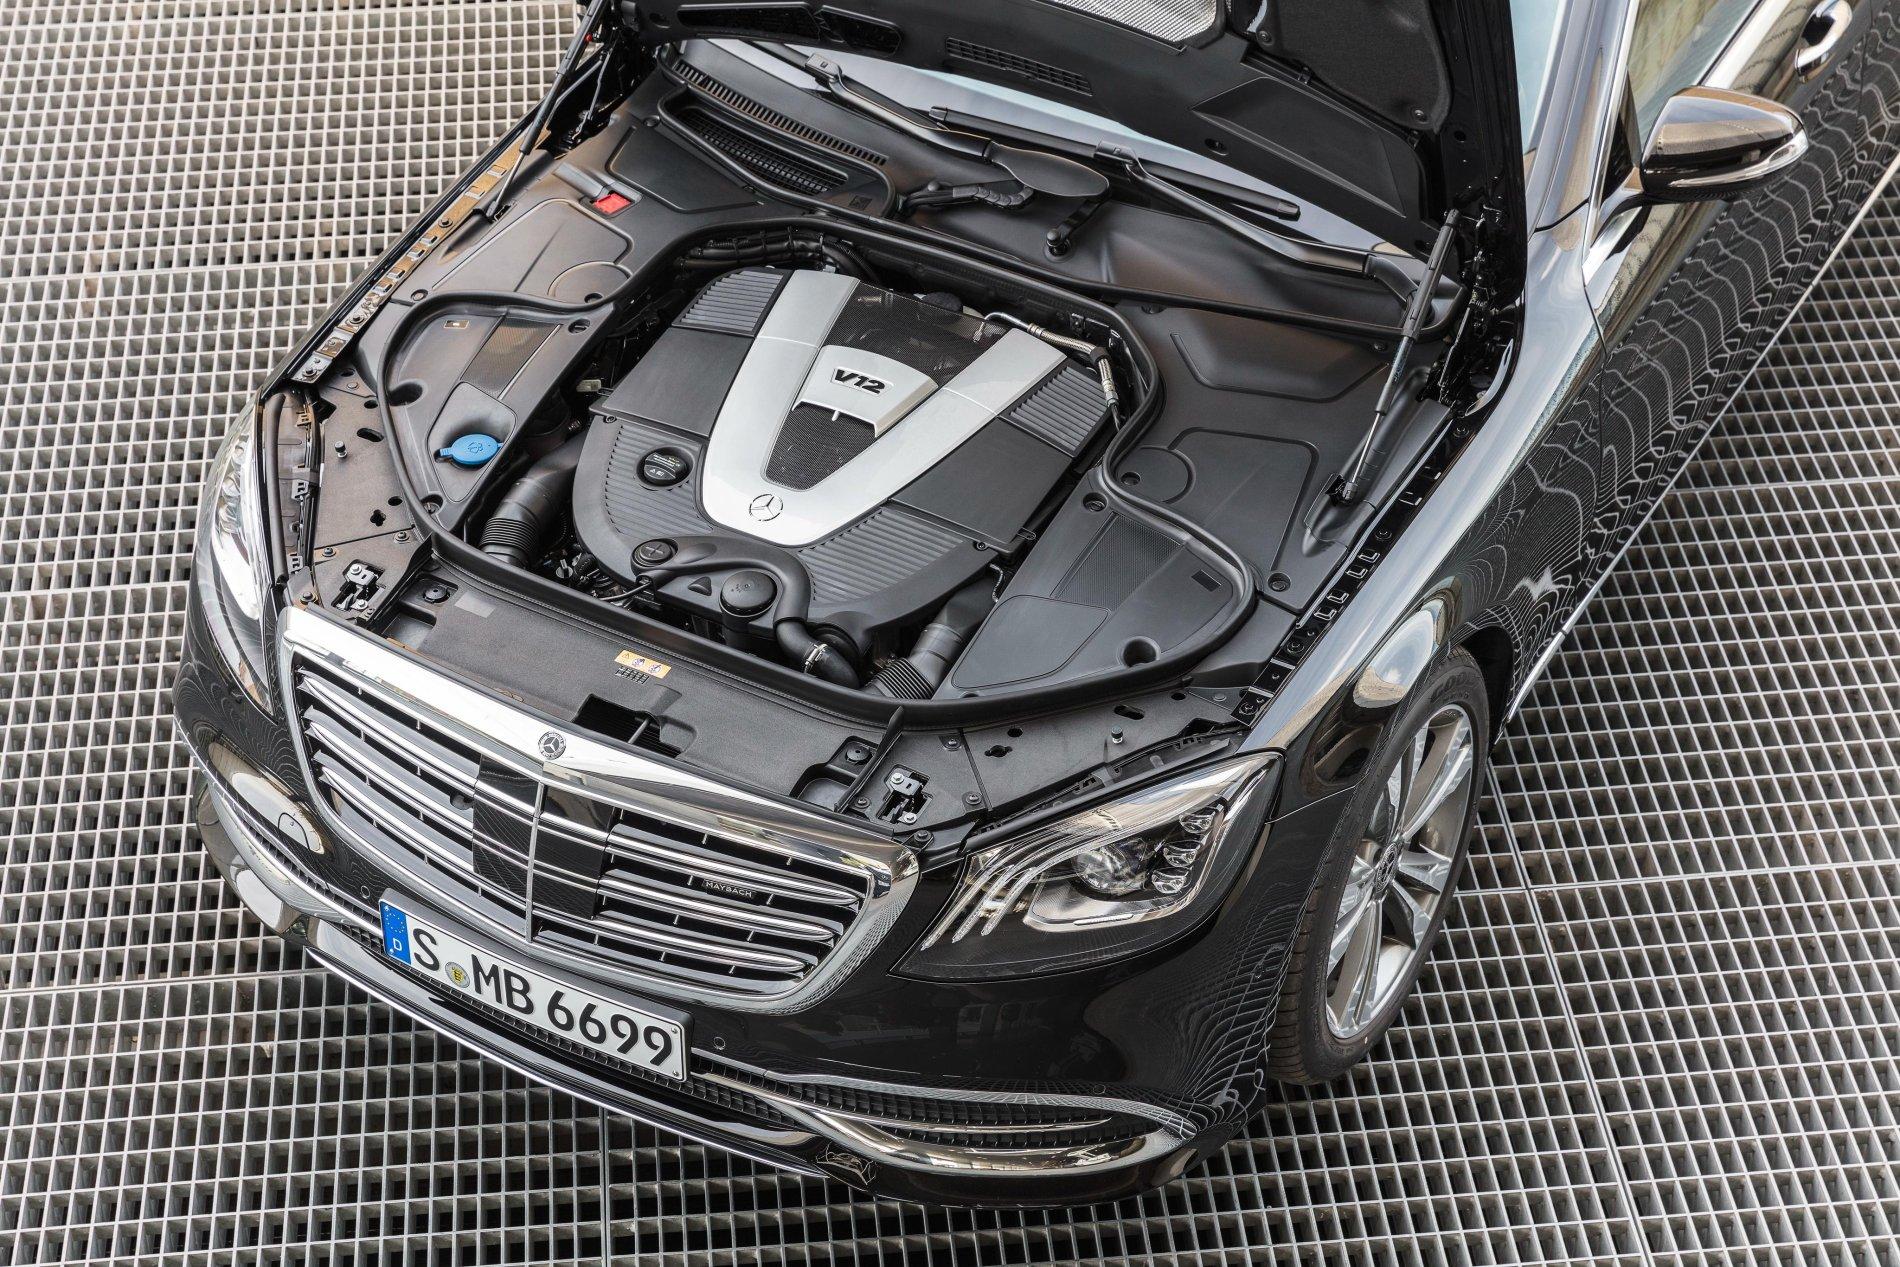 Mercedes-Maybach S650 - Mercedes-Maybach S650